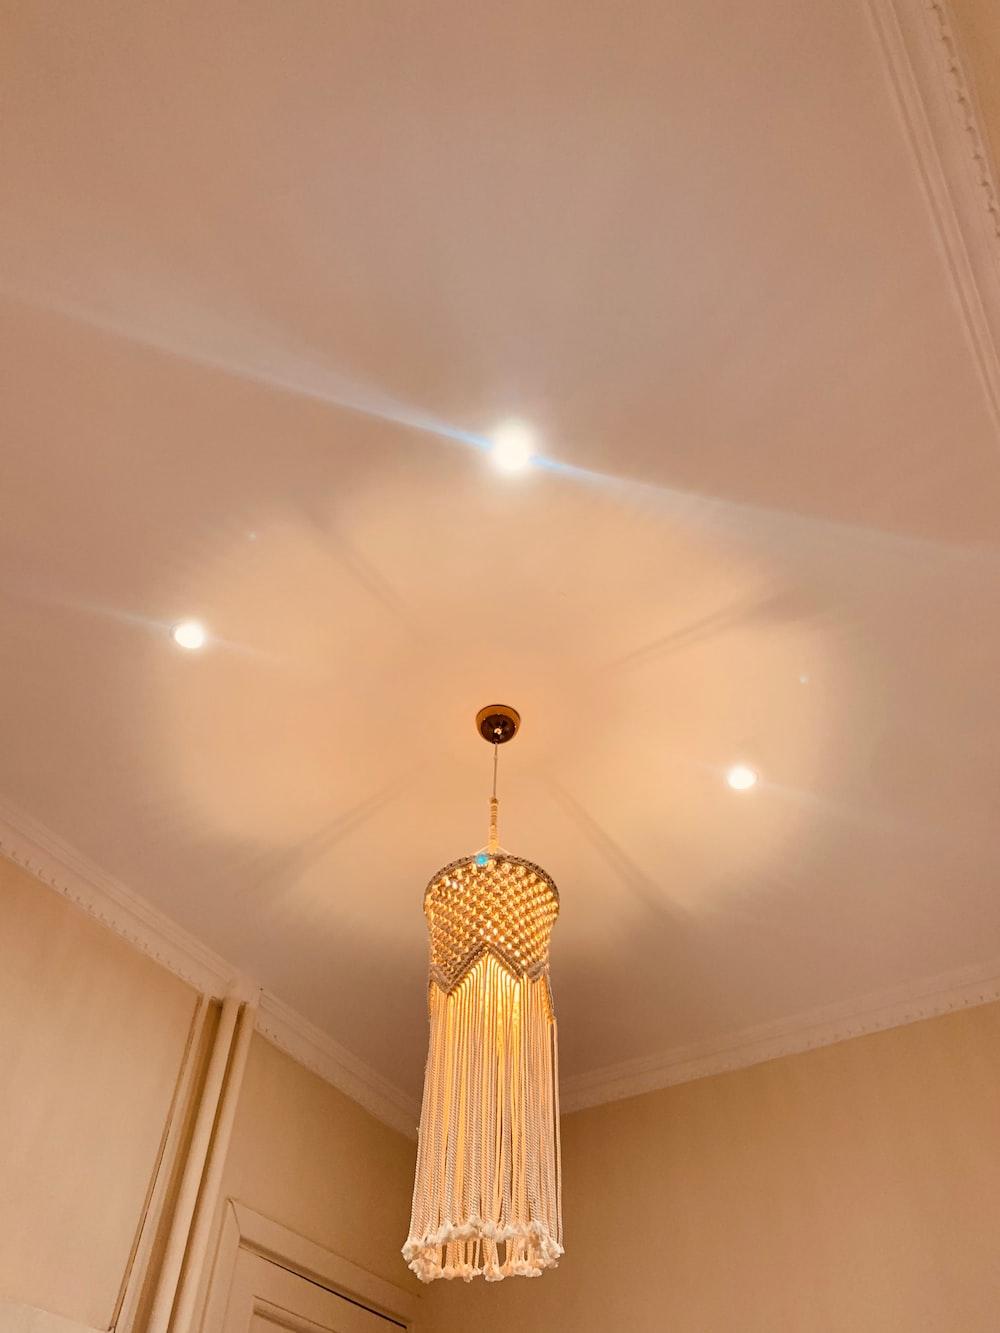 brown ceiling fan turned on